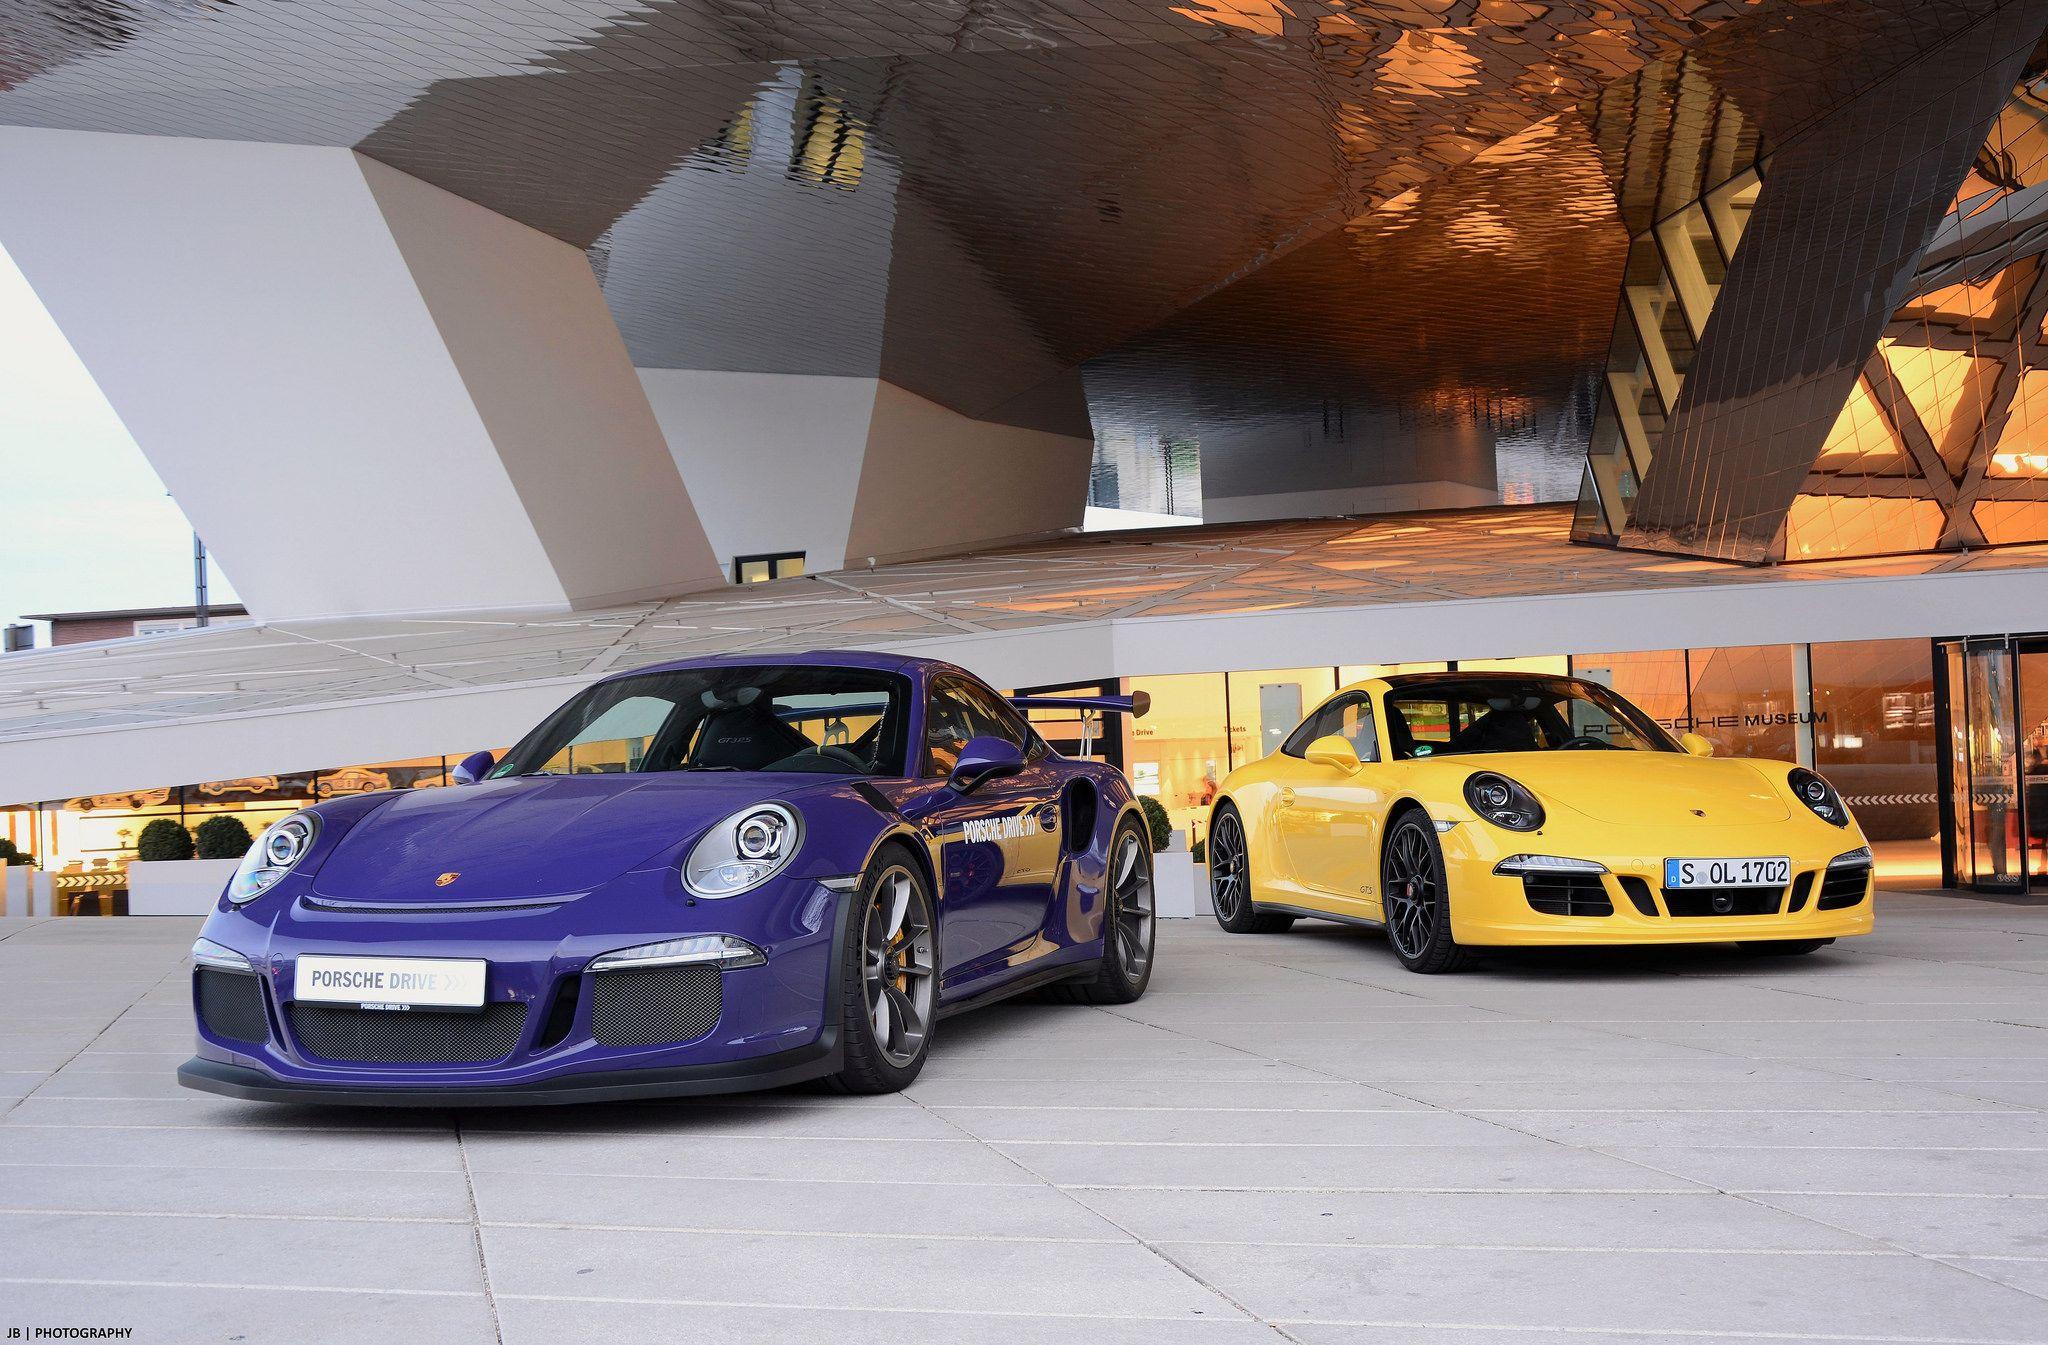 https://flic.kr/p/D3fLjE | RS & GTS | Porsche GT3 RS and Carrera GTS